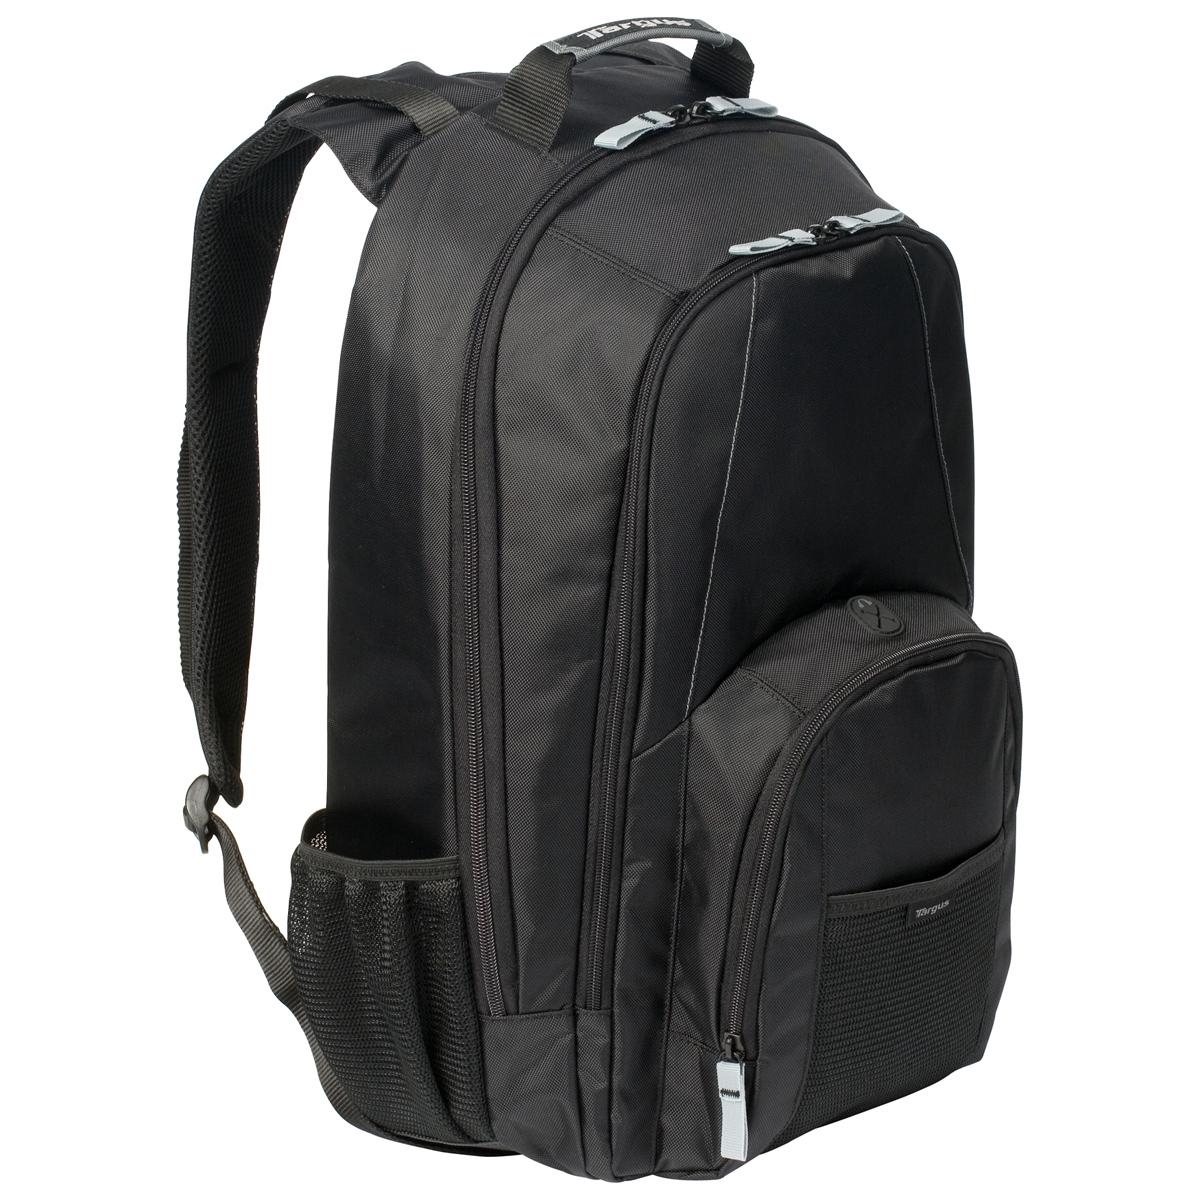 targus groove backpack 17 sac sacoche housse targus sur. Black Bedroom Furniture Sets. Home Design Ideas